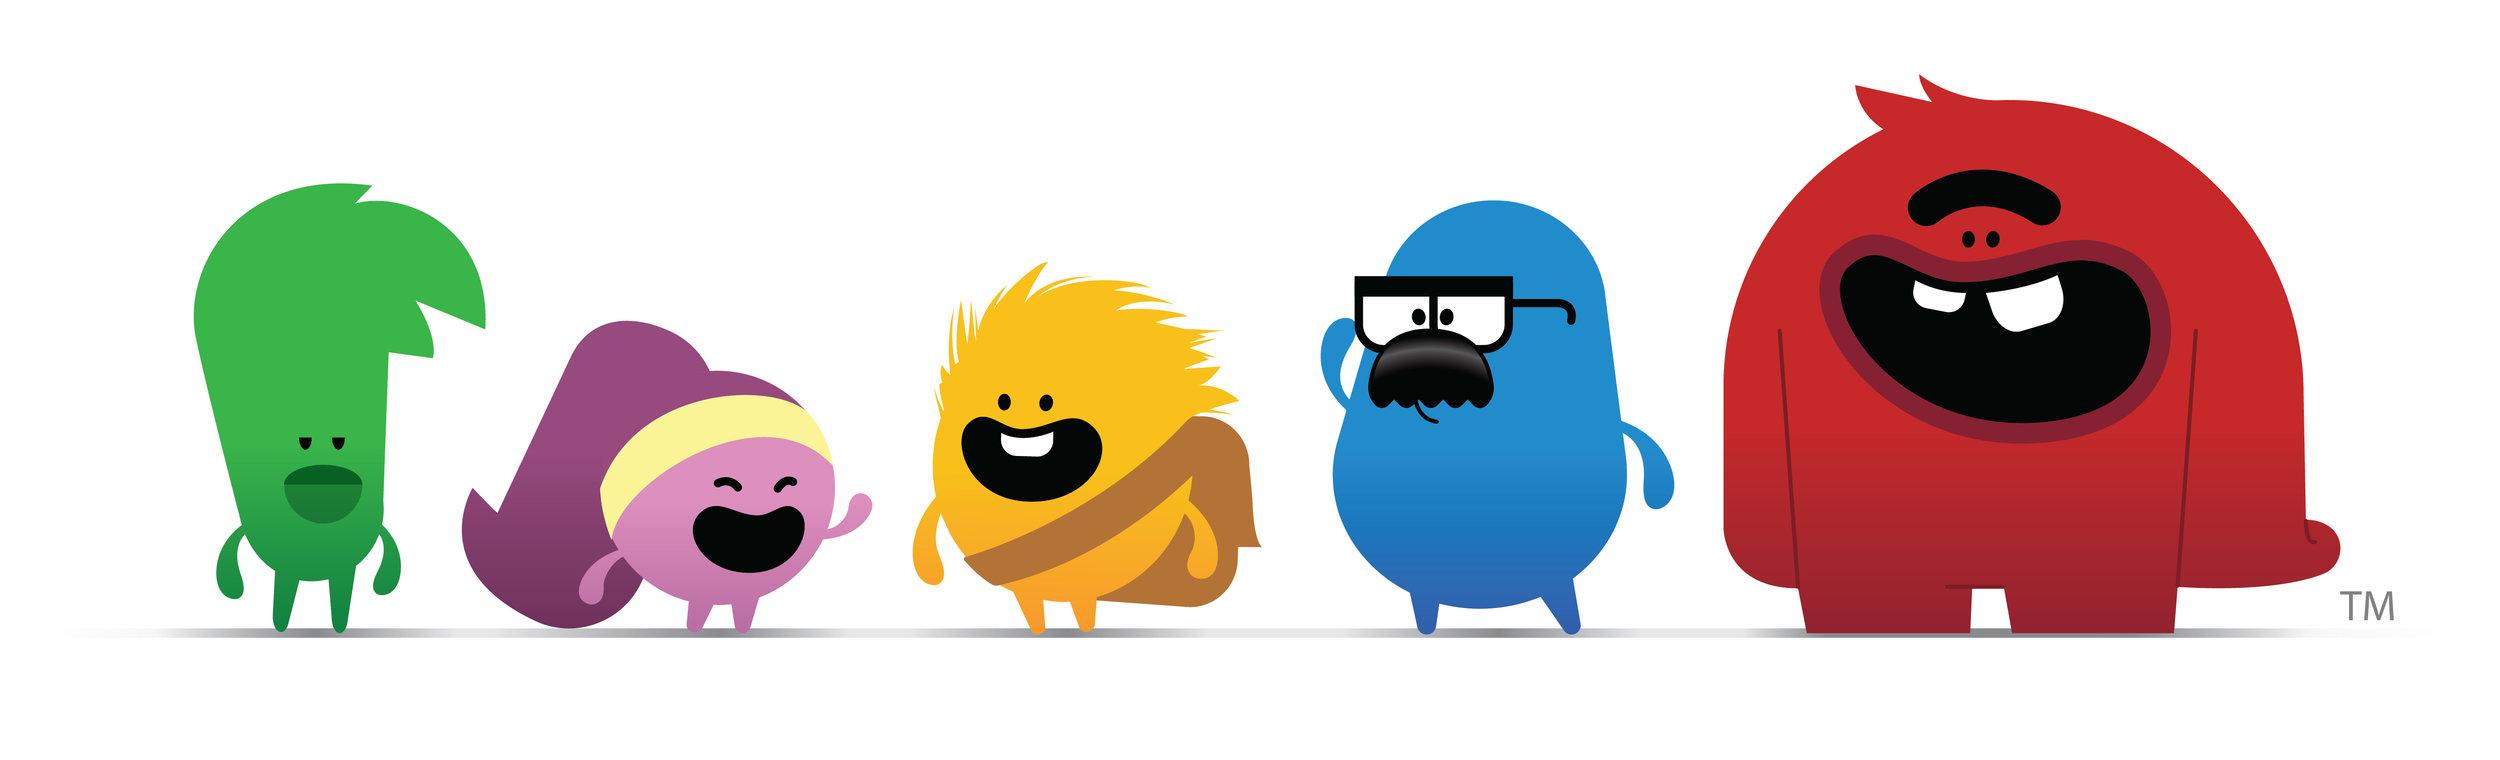 SUNDY_Rakbo_Characters_V4_RGB.jpg